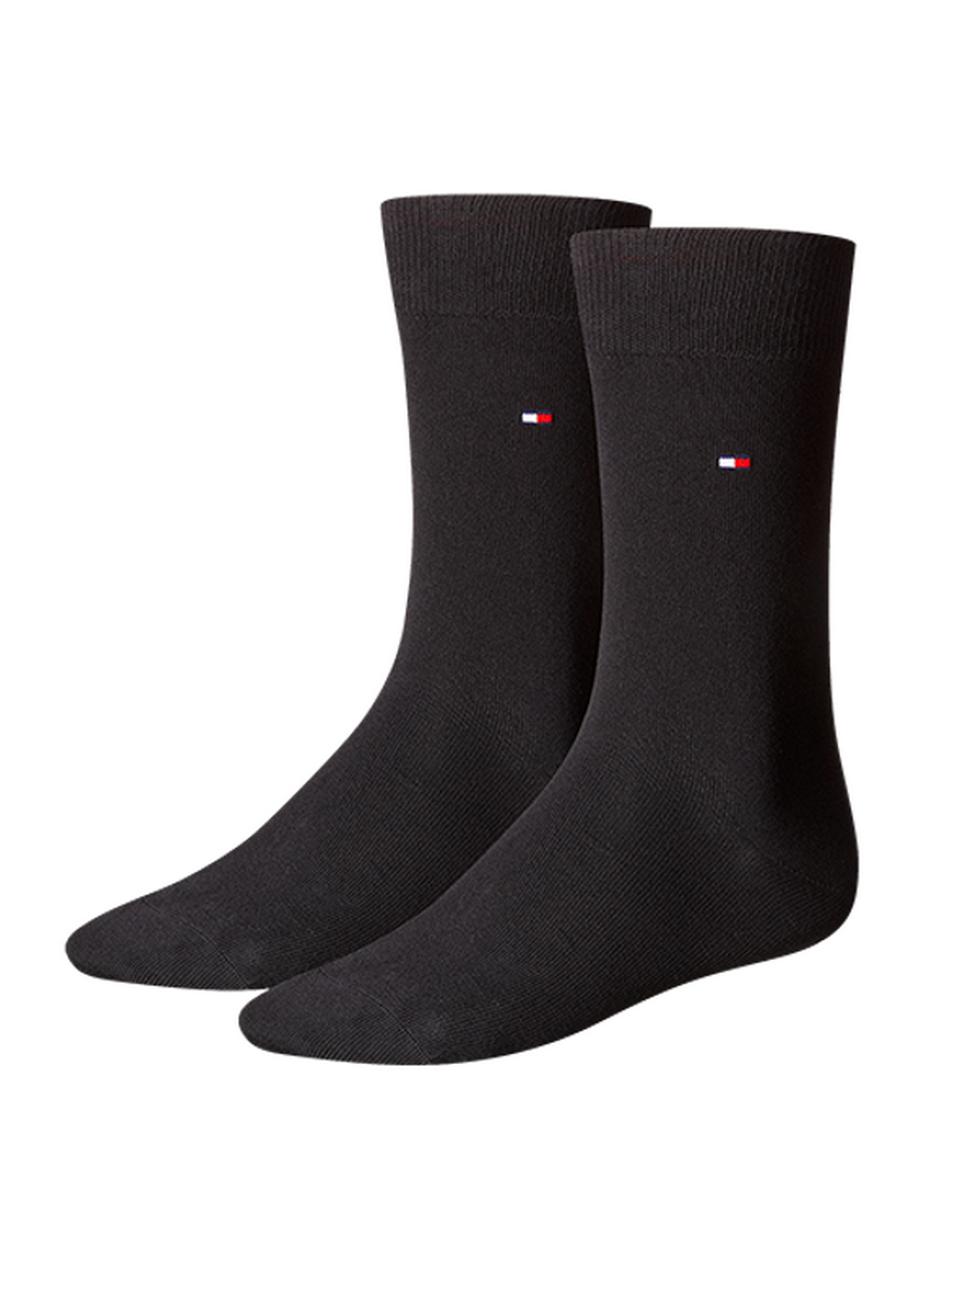 Tommy Hilfiger Herrensocken Classic Business Socken - 2er Pack